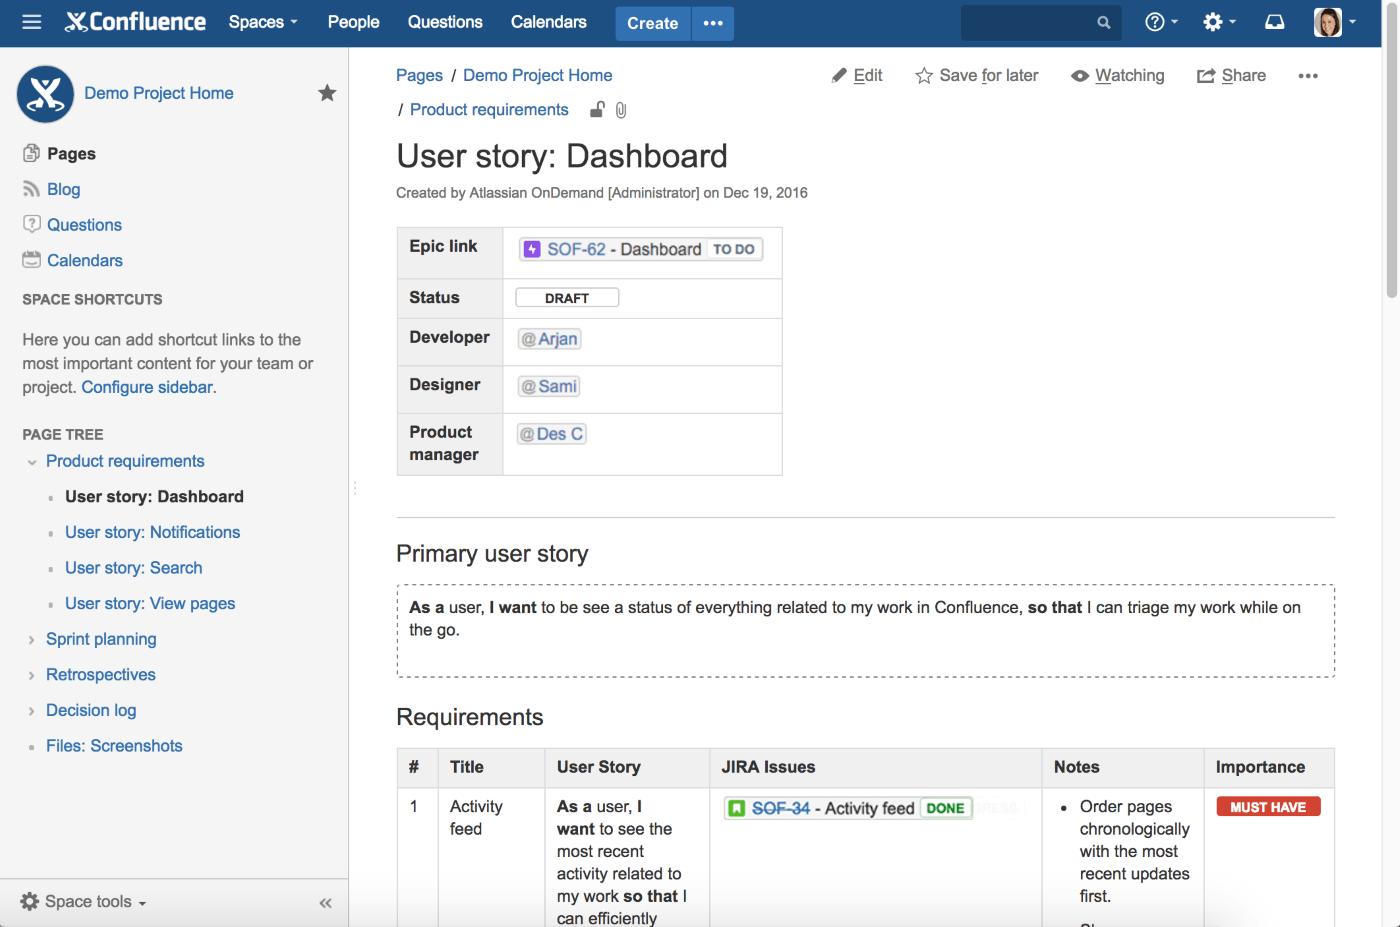 Confluence by Atlassian Desktop View